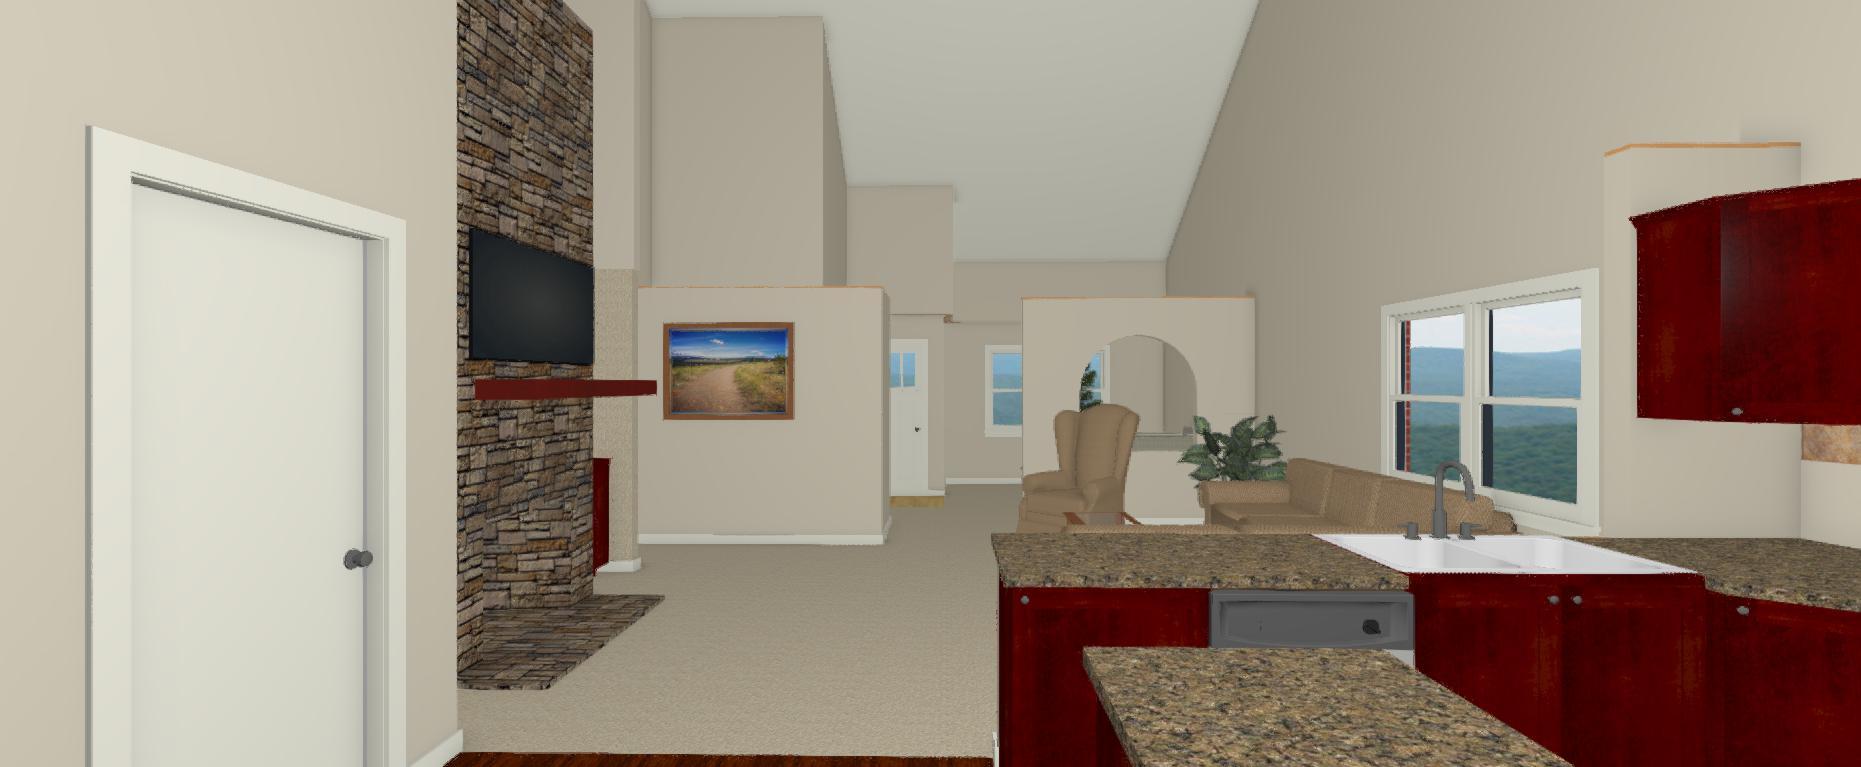 Holt 3D view 2